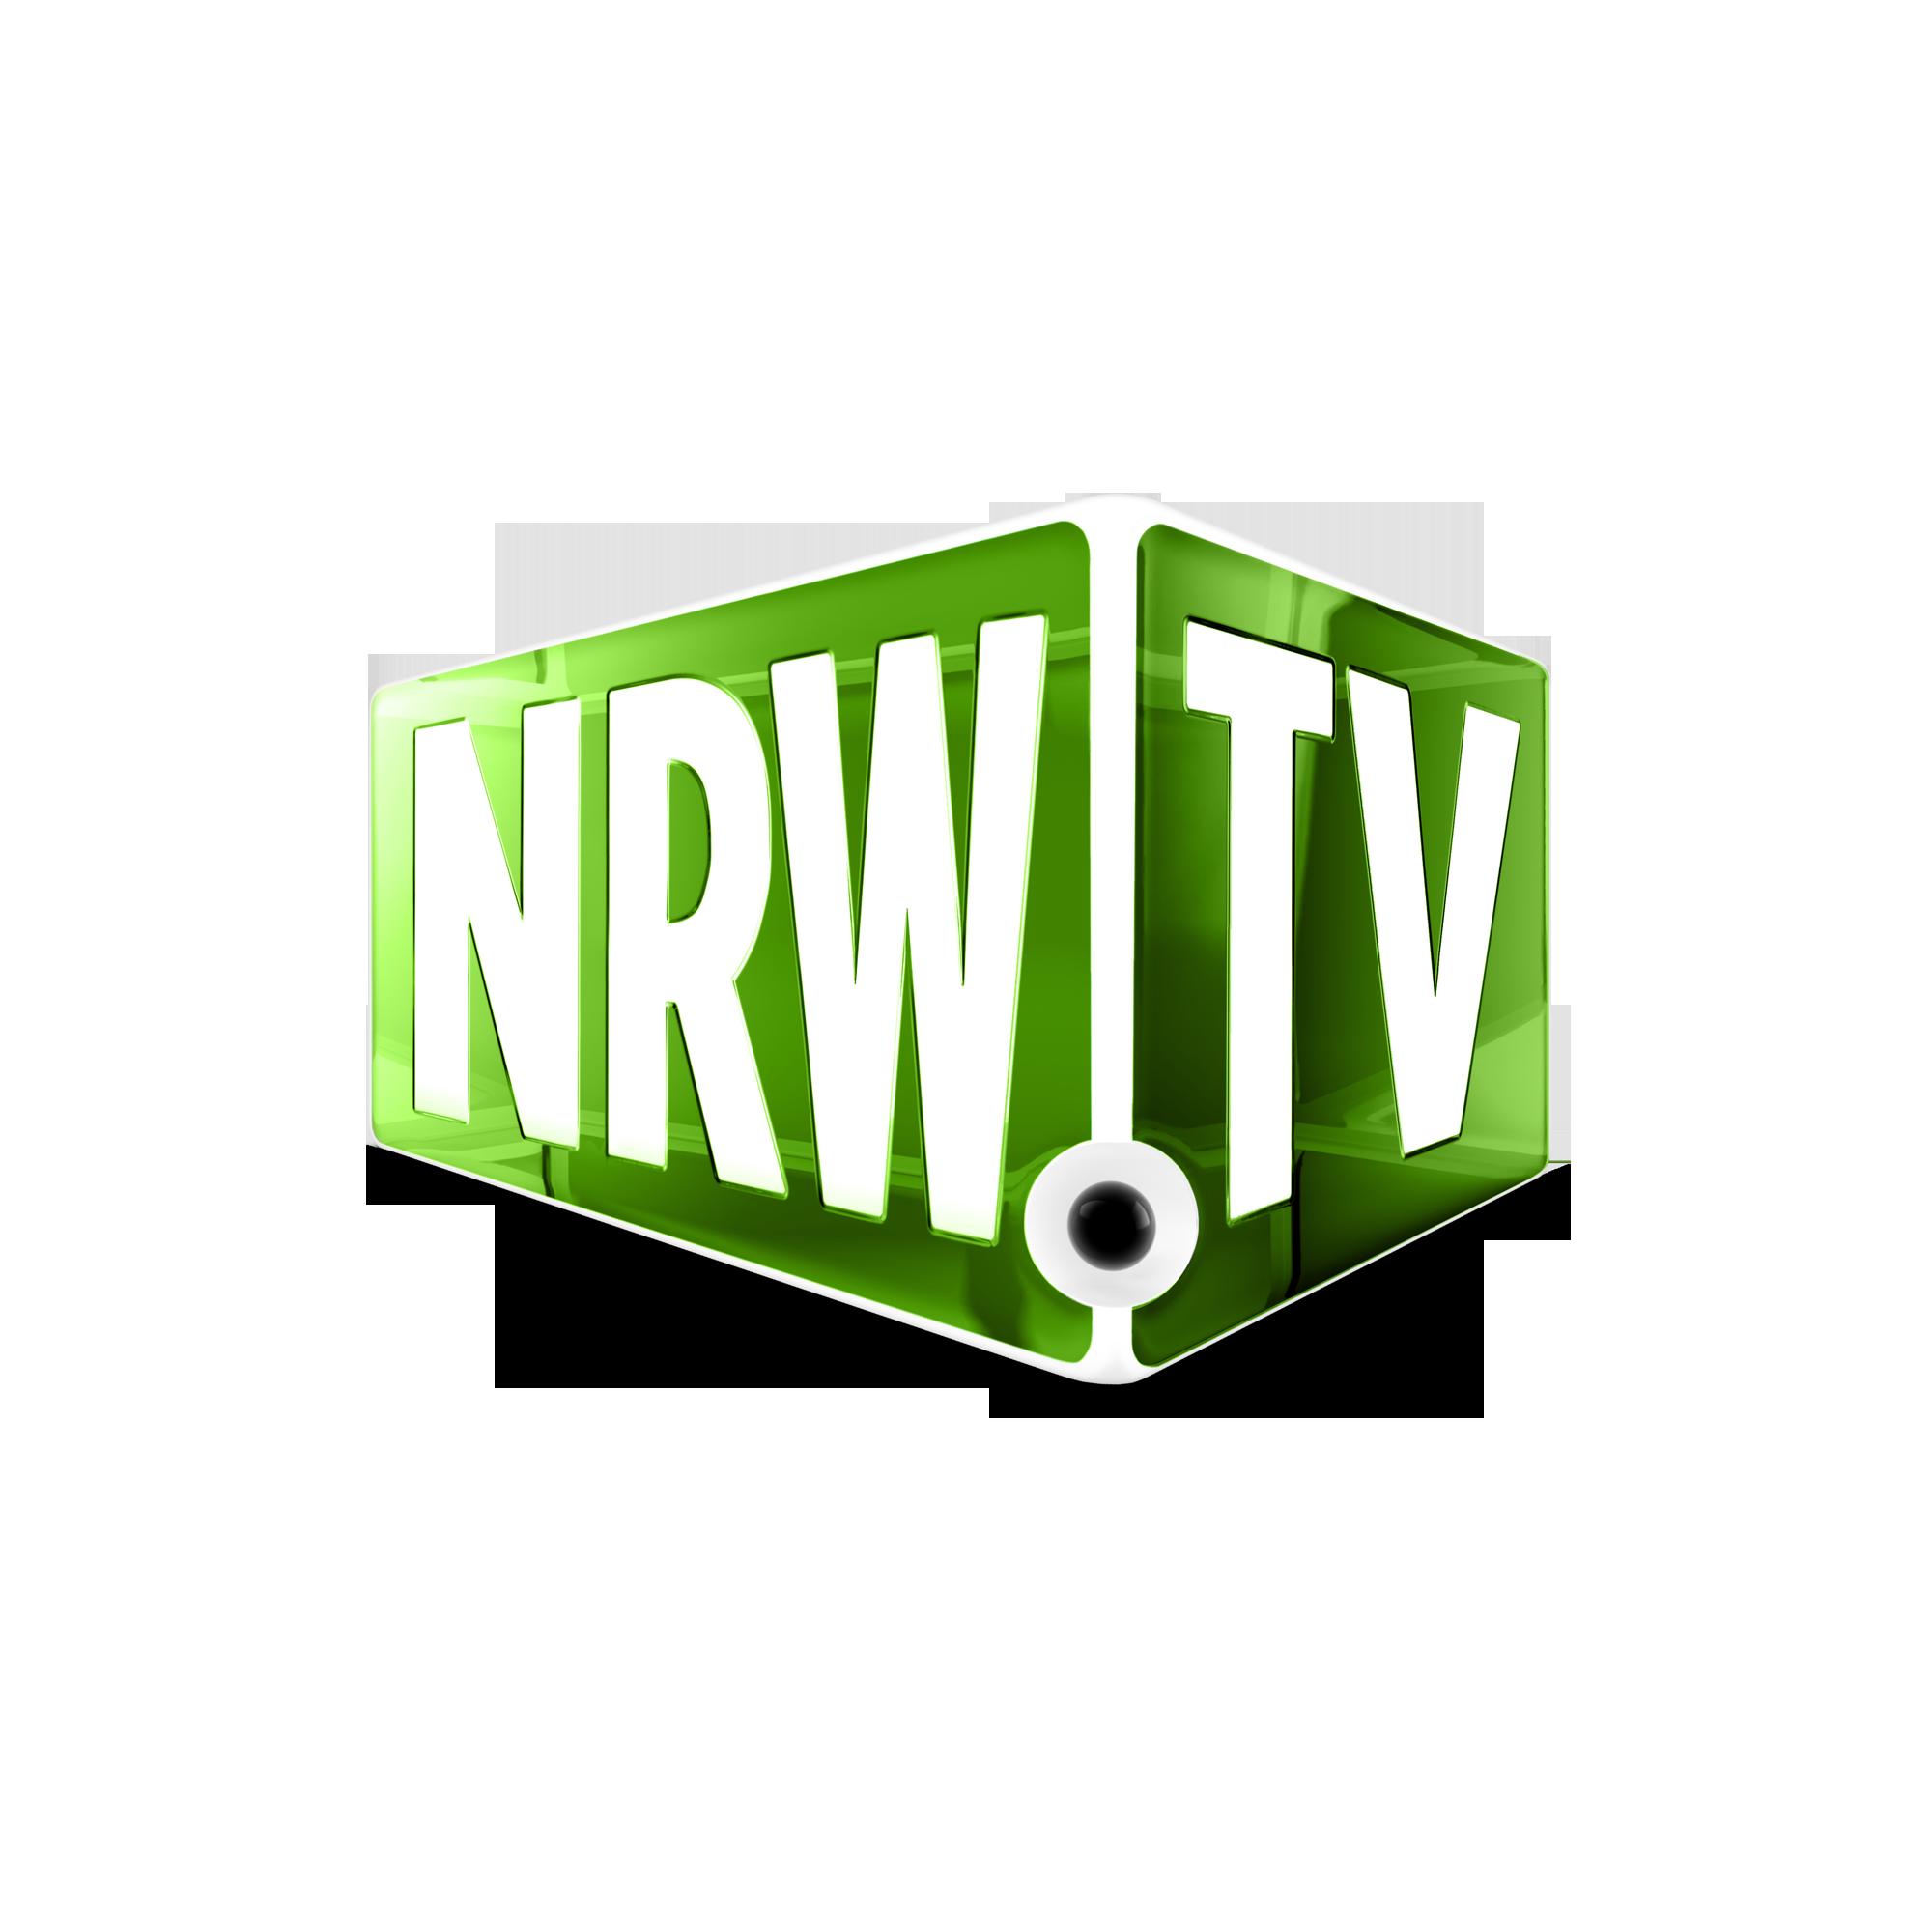 http://www.jekelpartner.de/wp-content/uploads/2011/11/logo-nrwtv-3d.png